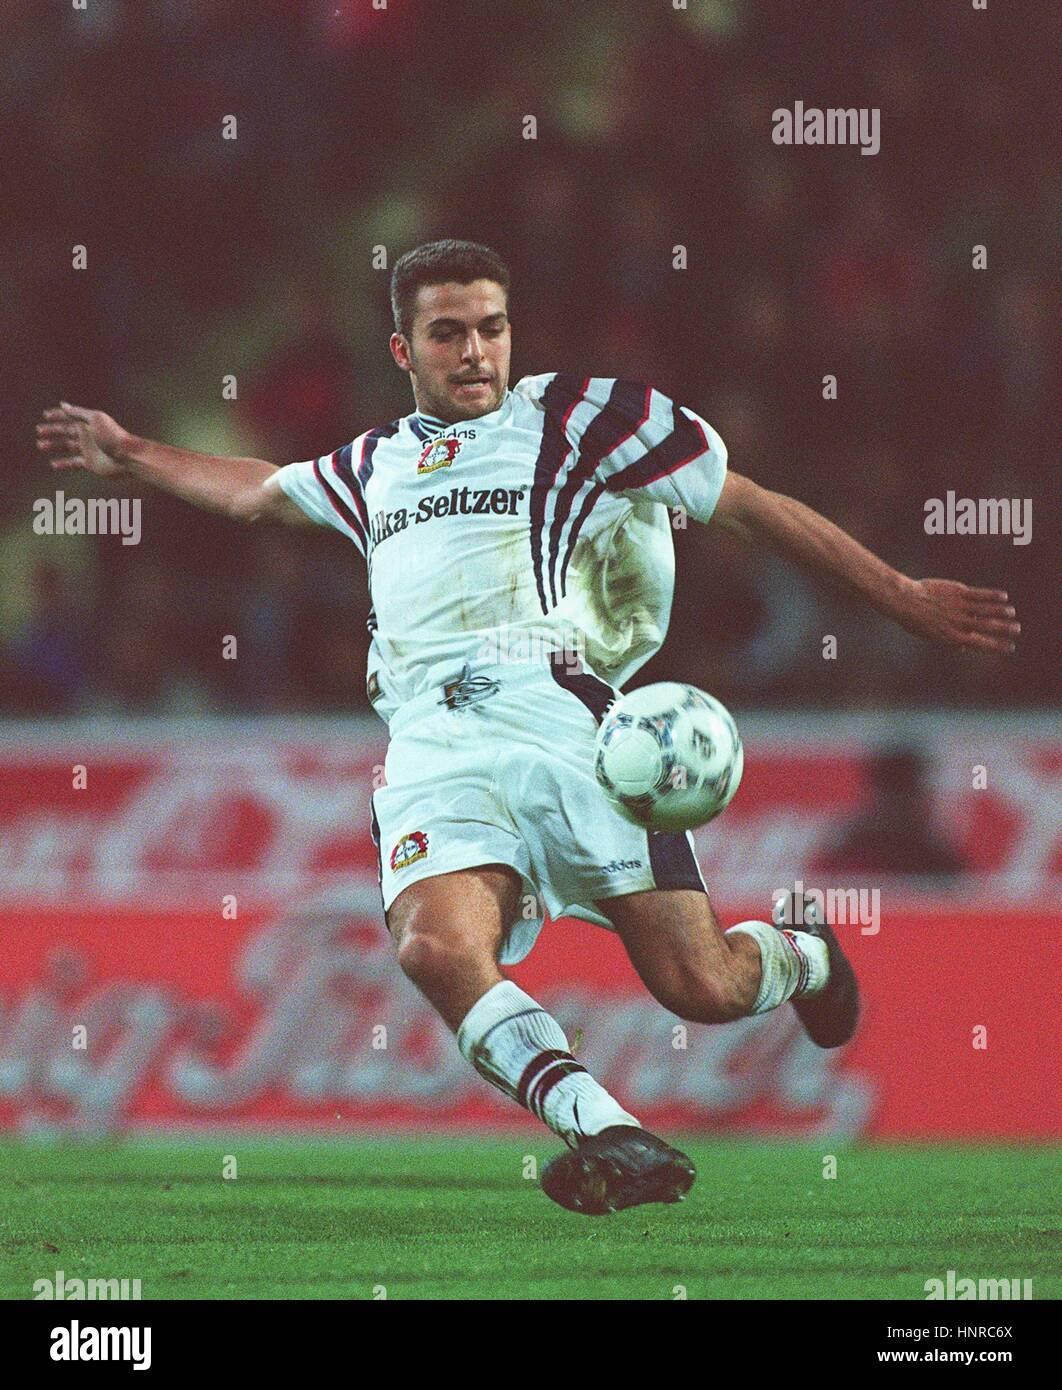 ZE ELIAS TSV BAYER 04 LEVERKUSEN 24 October 1996 - Stock Image